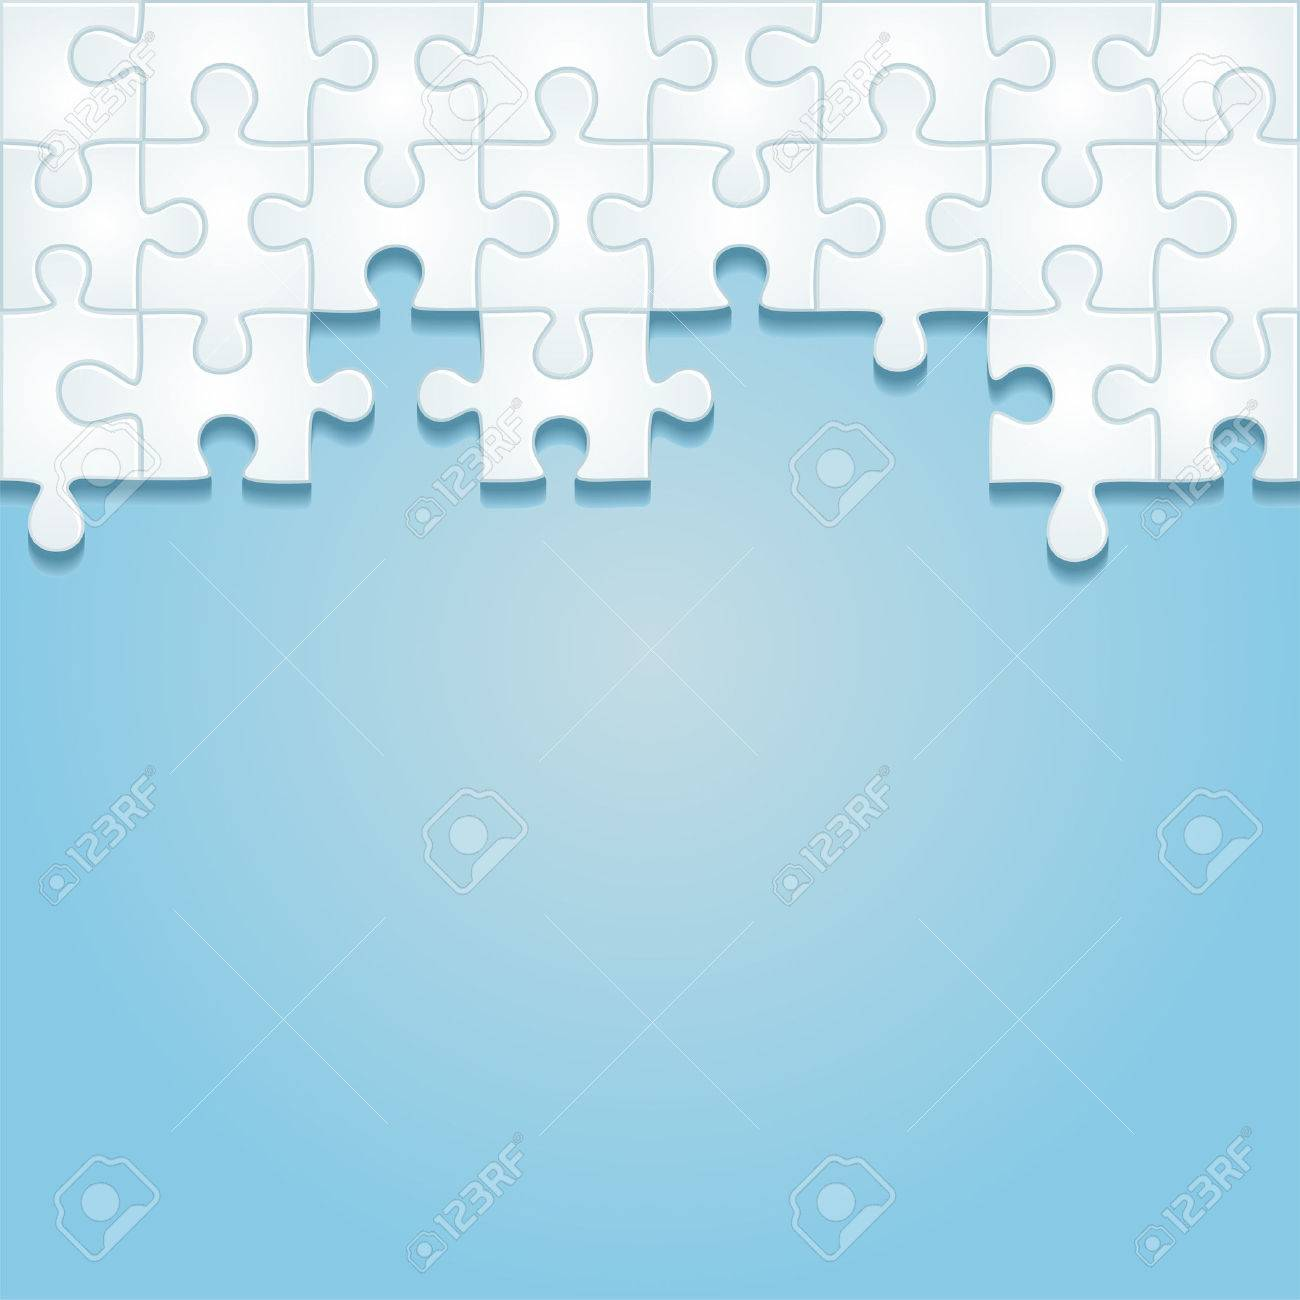 Puzzle frame background. Vector illustration - 41652259